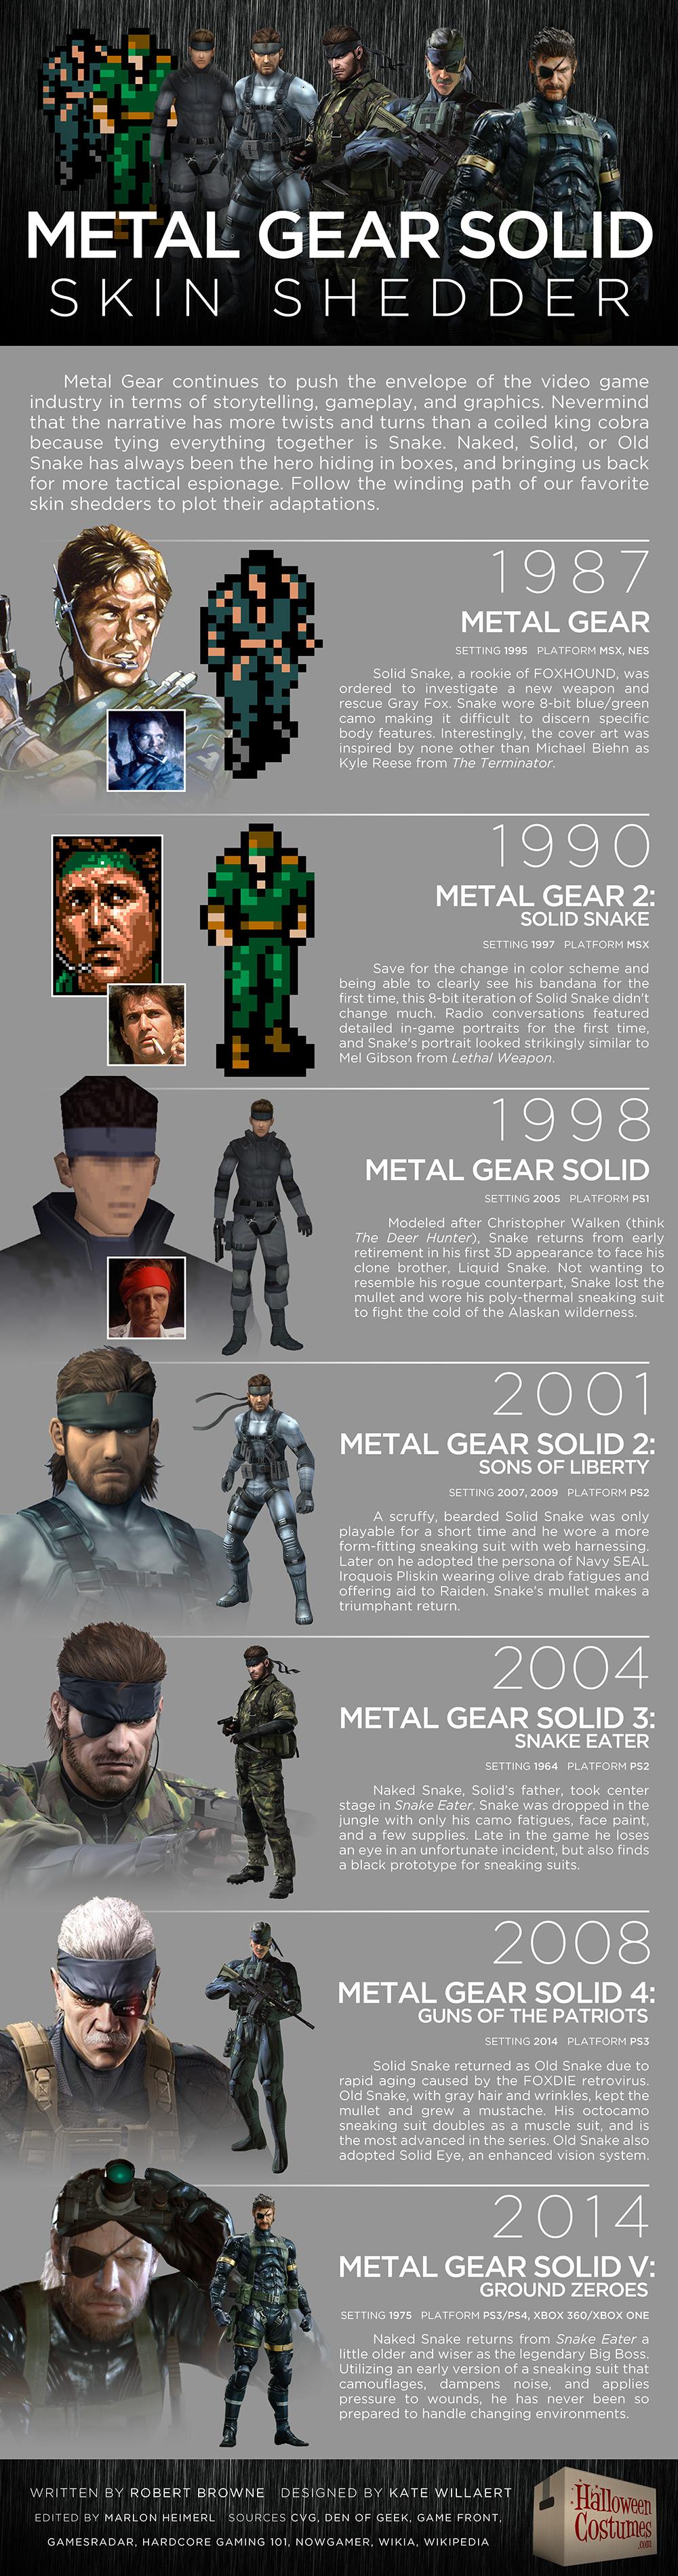 Metal Gear Solid Evolution 1008